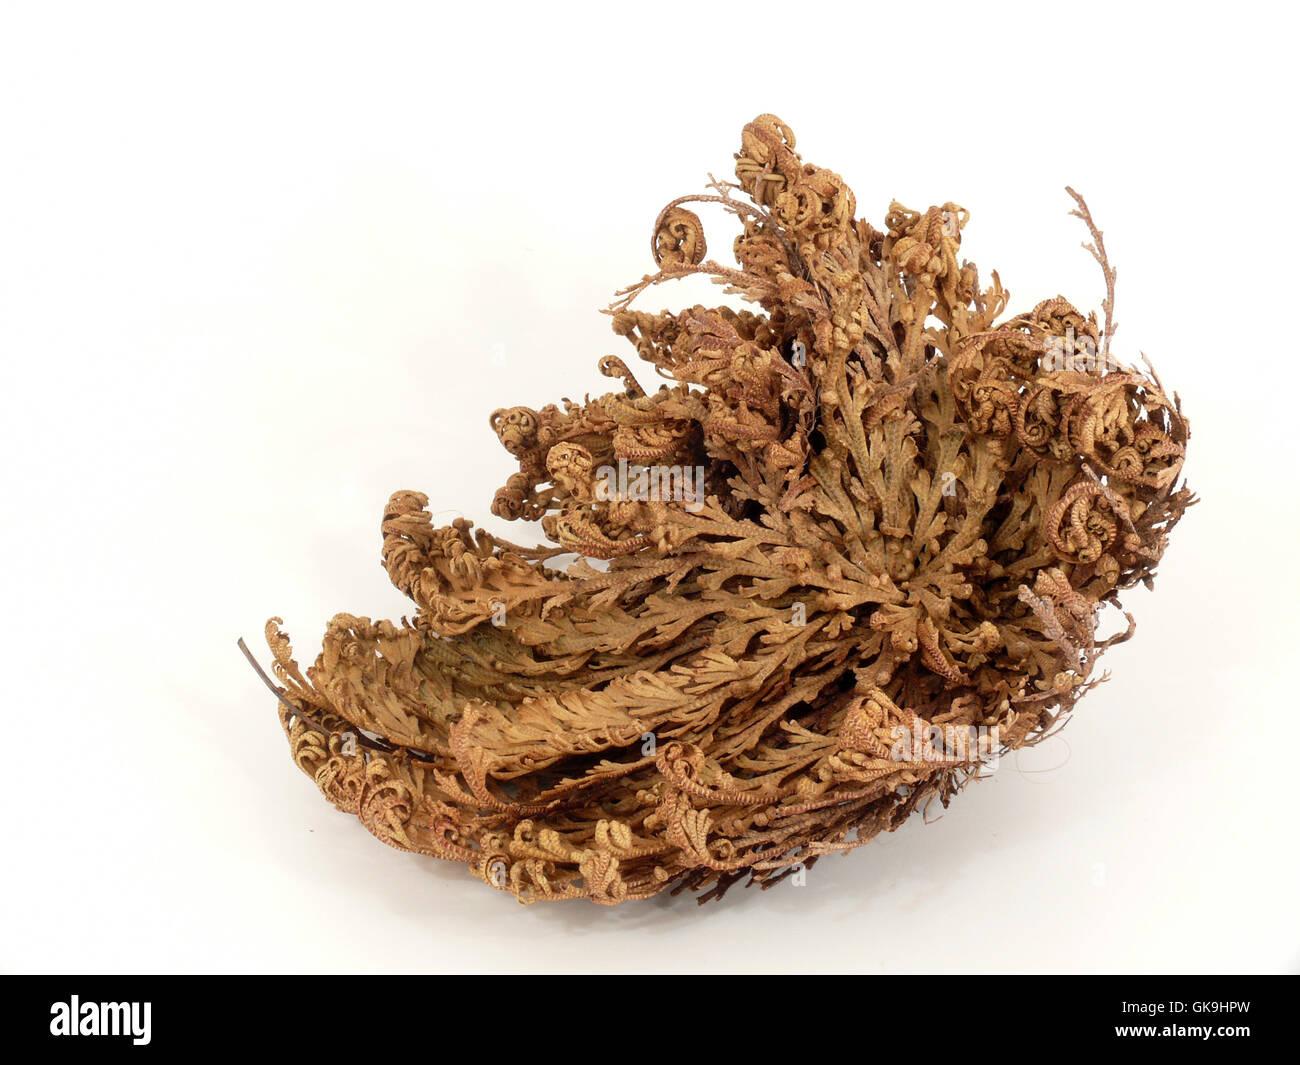 rose of jericho - Stock Image